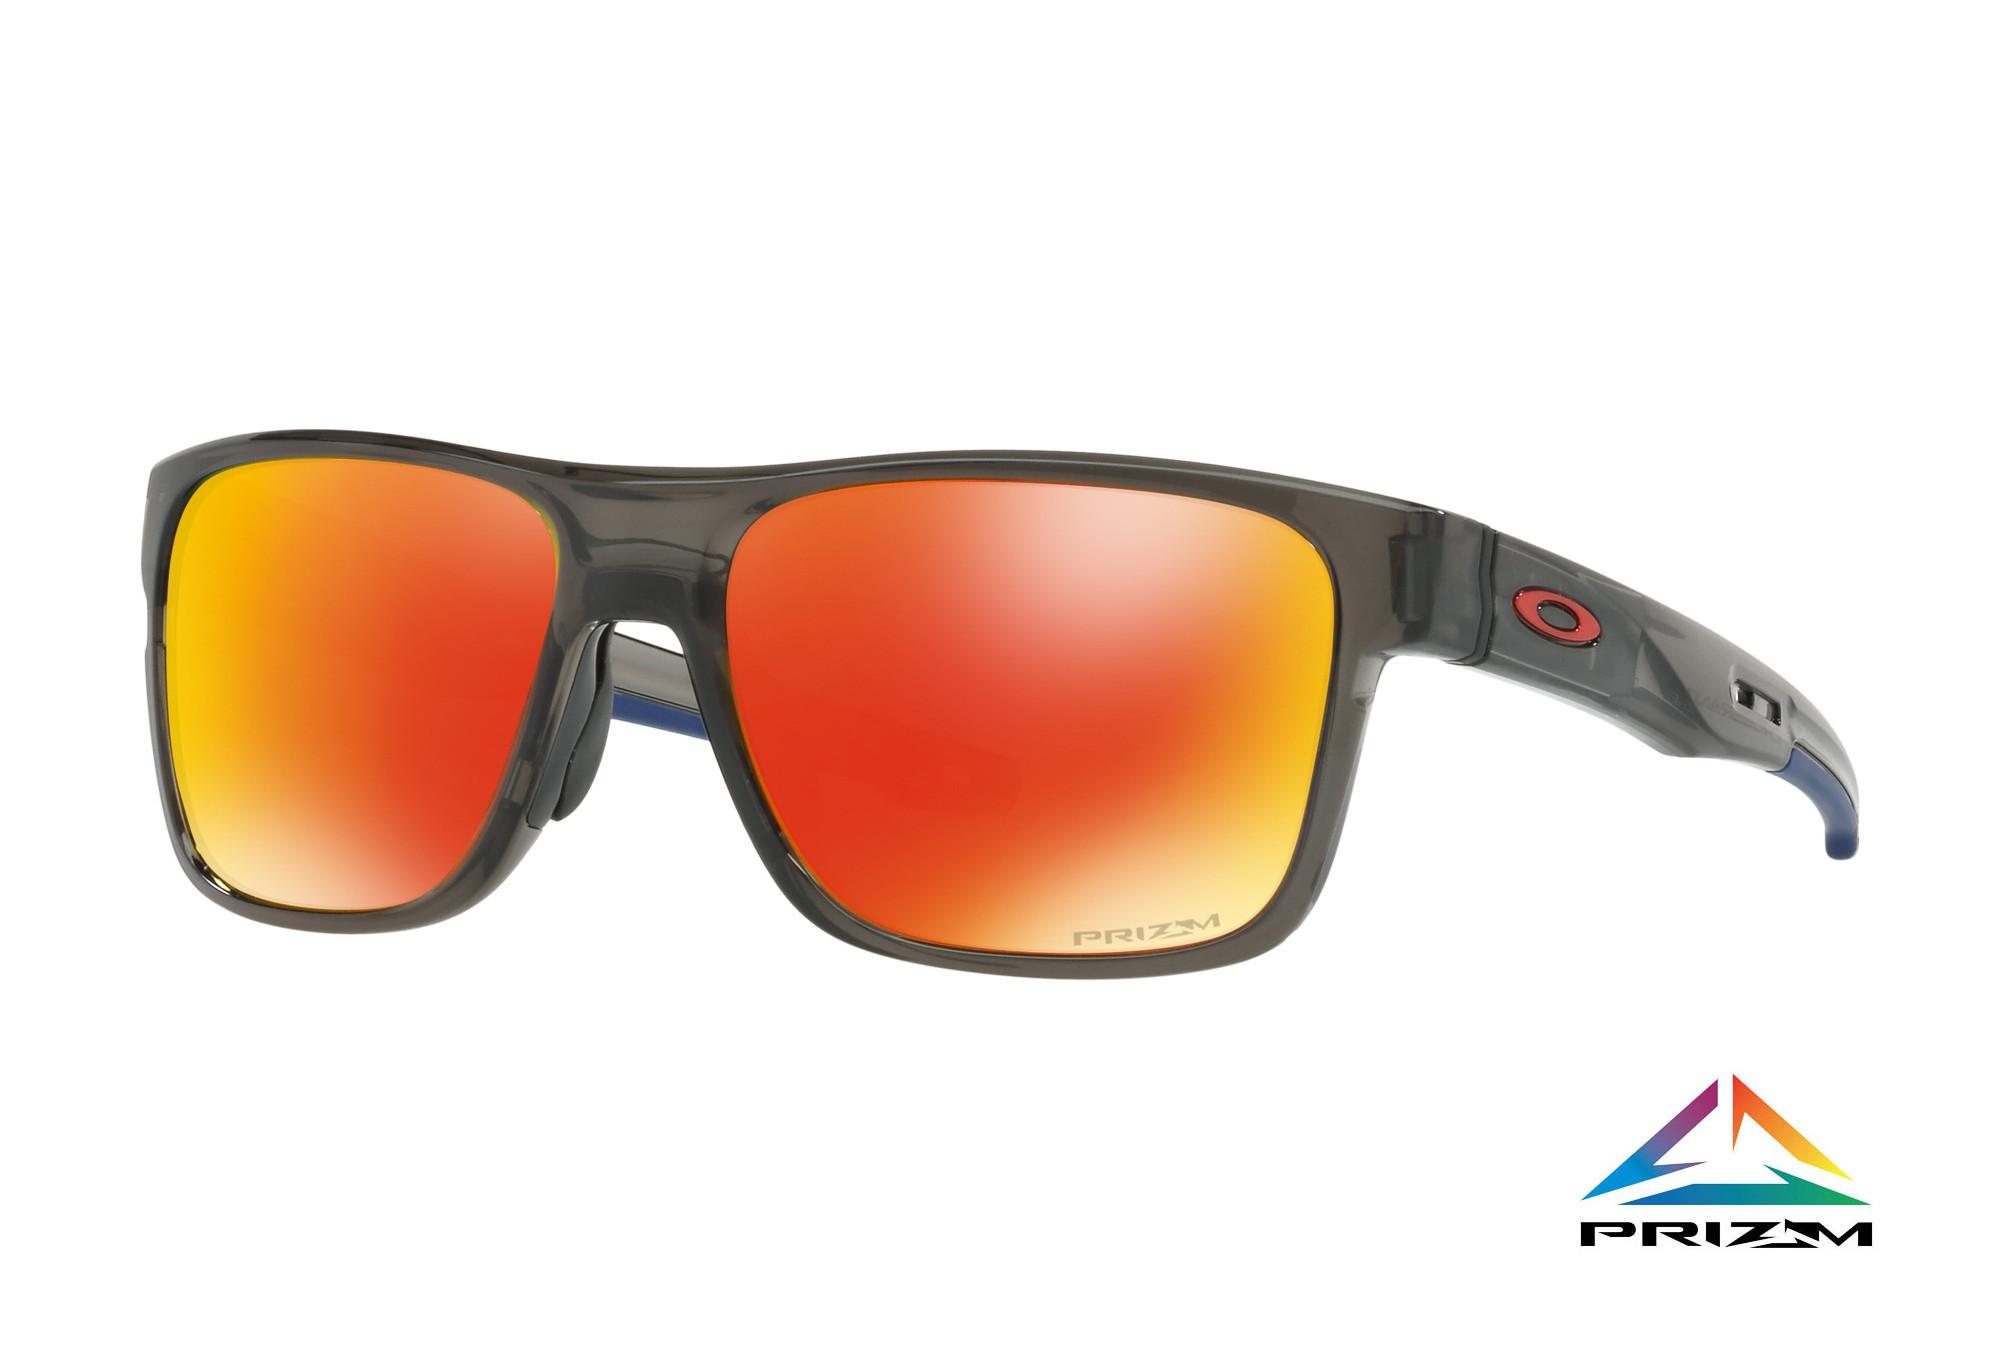 41fb940548 OAKLEY Sunglasses Crossrange Gray Smoke - Prizm Ruby Ref OO9361-1257 ...